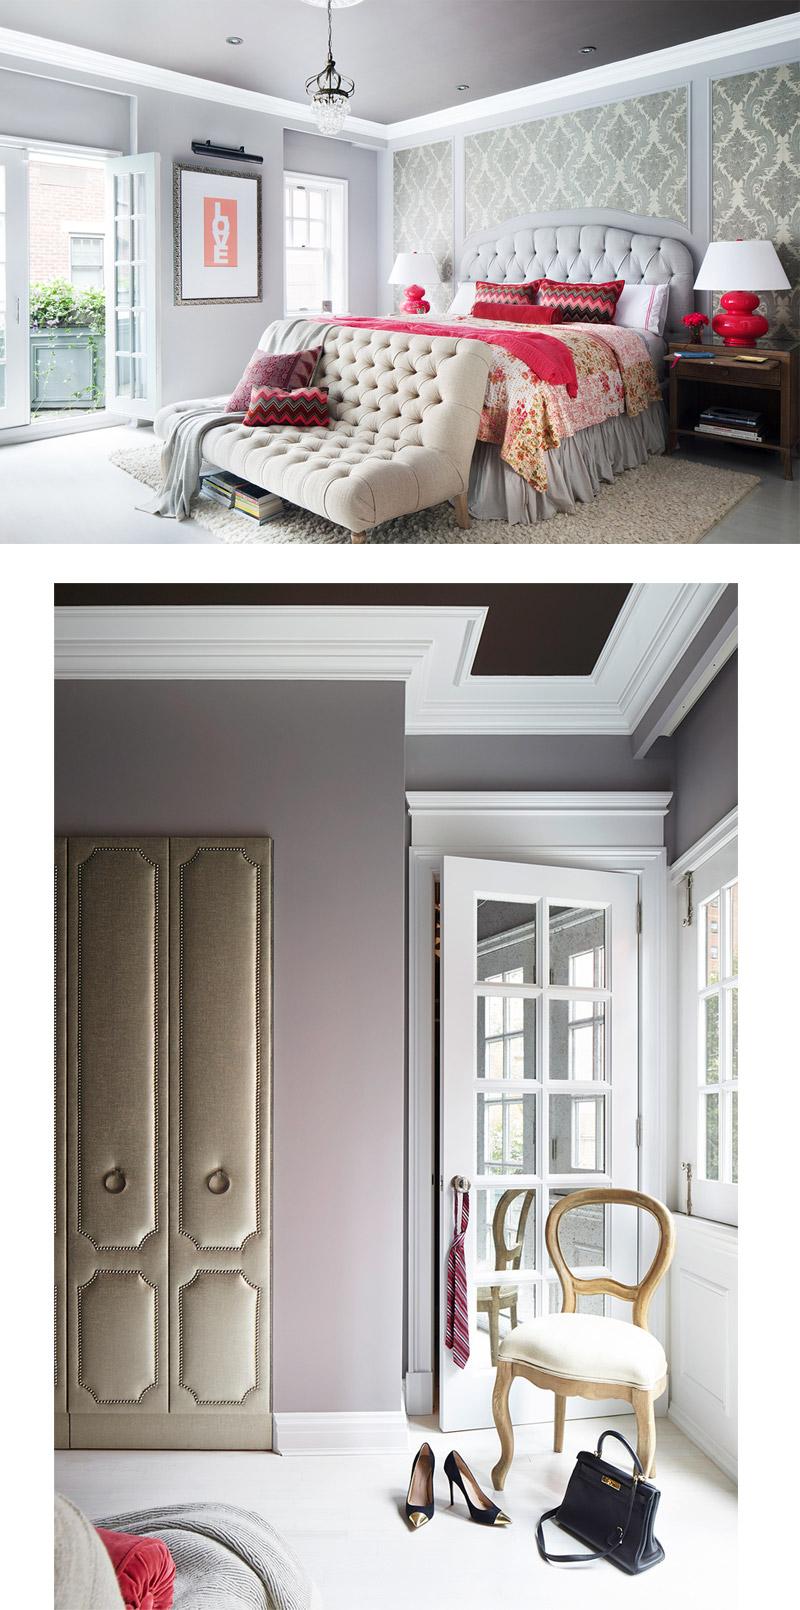 living-gazette-barbara-resende-decor-tour-townhouse-tradicional-sutil-suite-classica